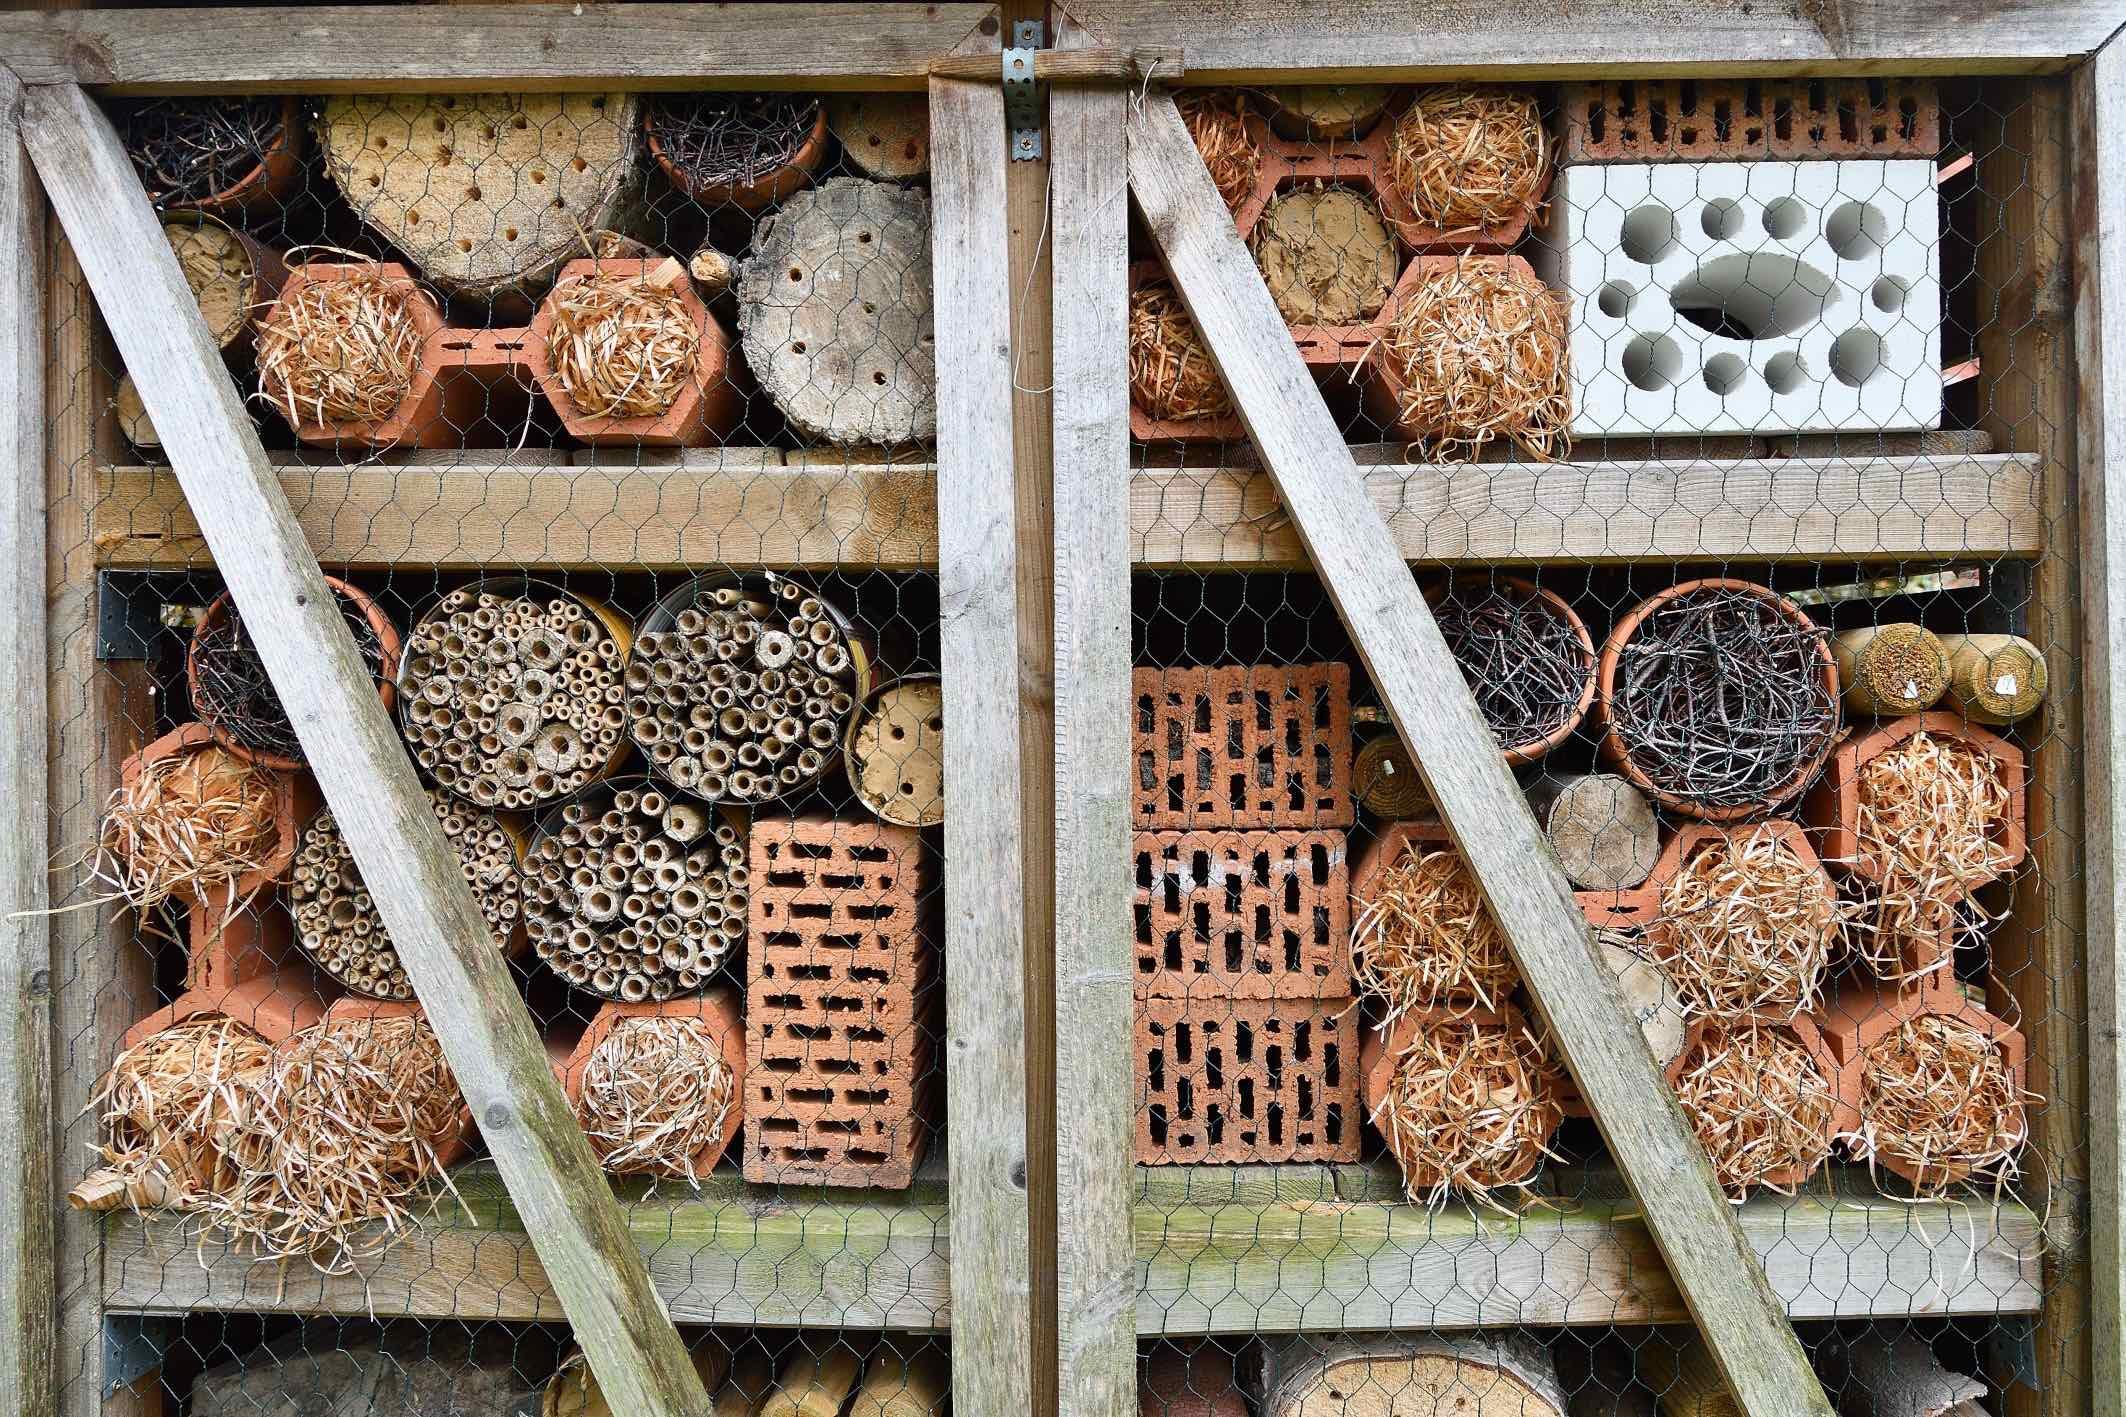 Tag der StadtNatur Insektenhotels (Foto: Lutz Leitmann / Stadt Bochum)